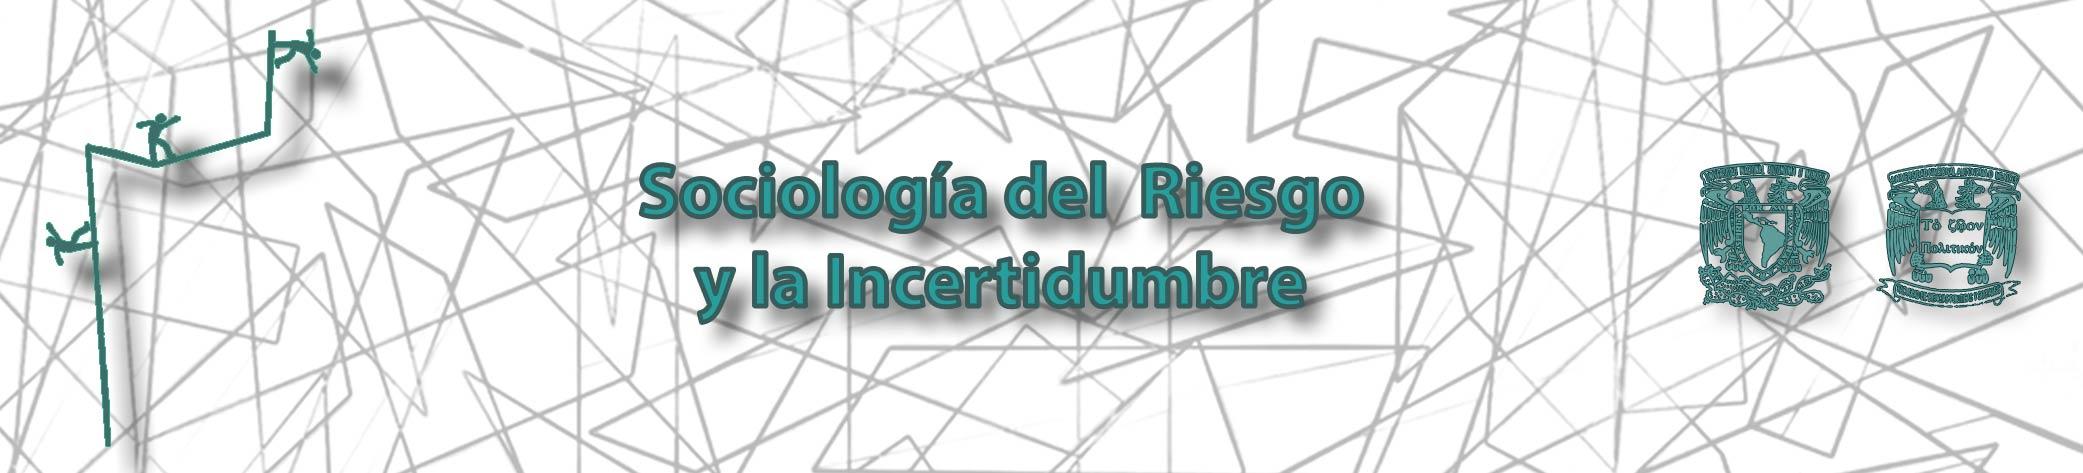 Sociología, riesgo e incertidumbre